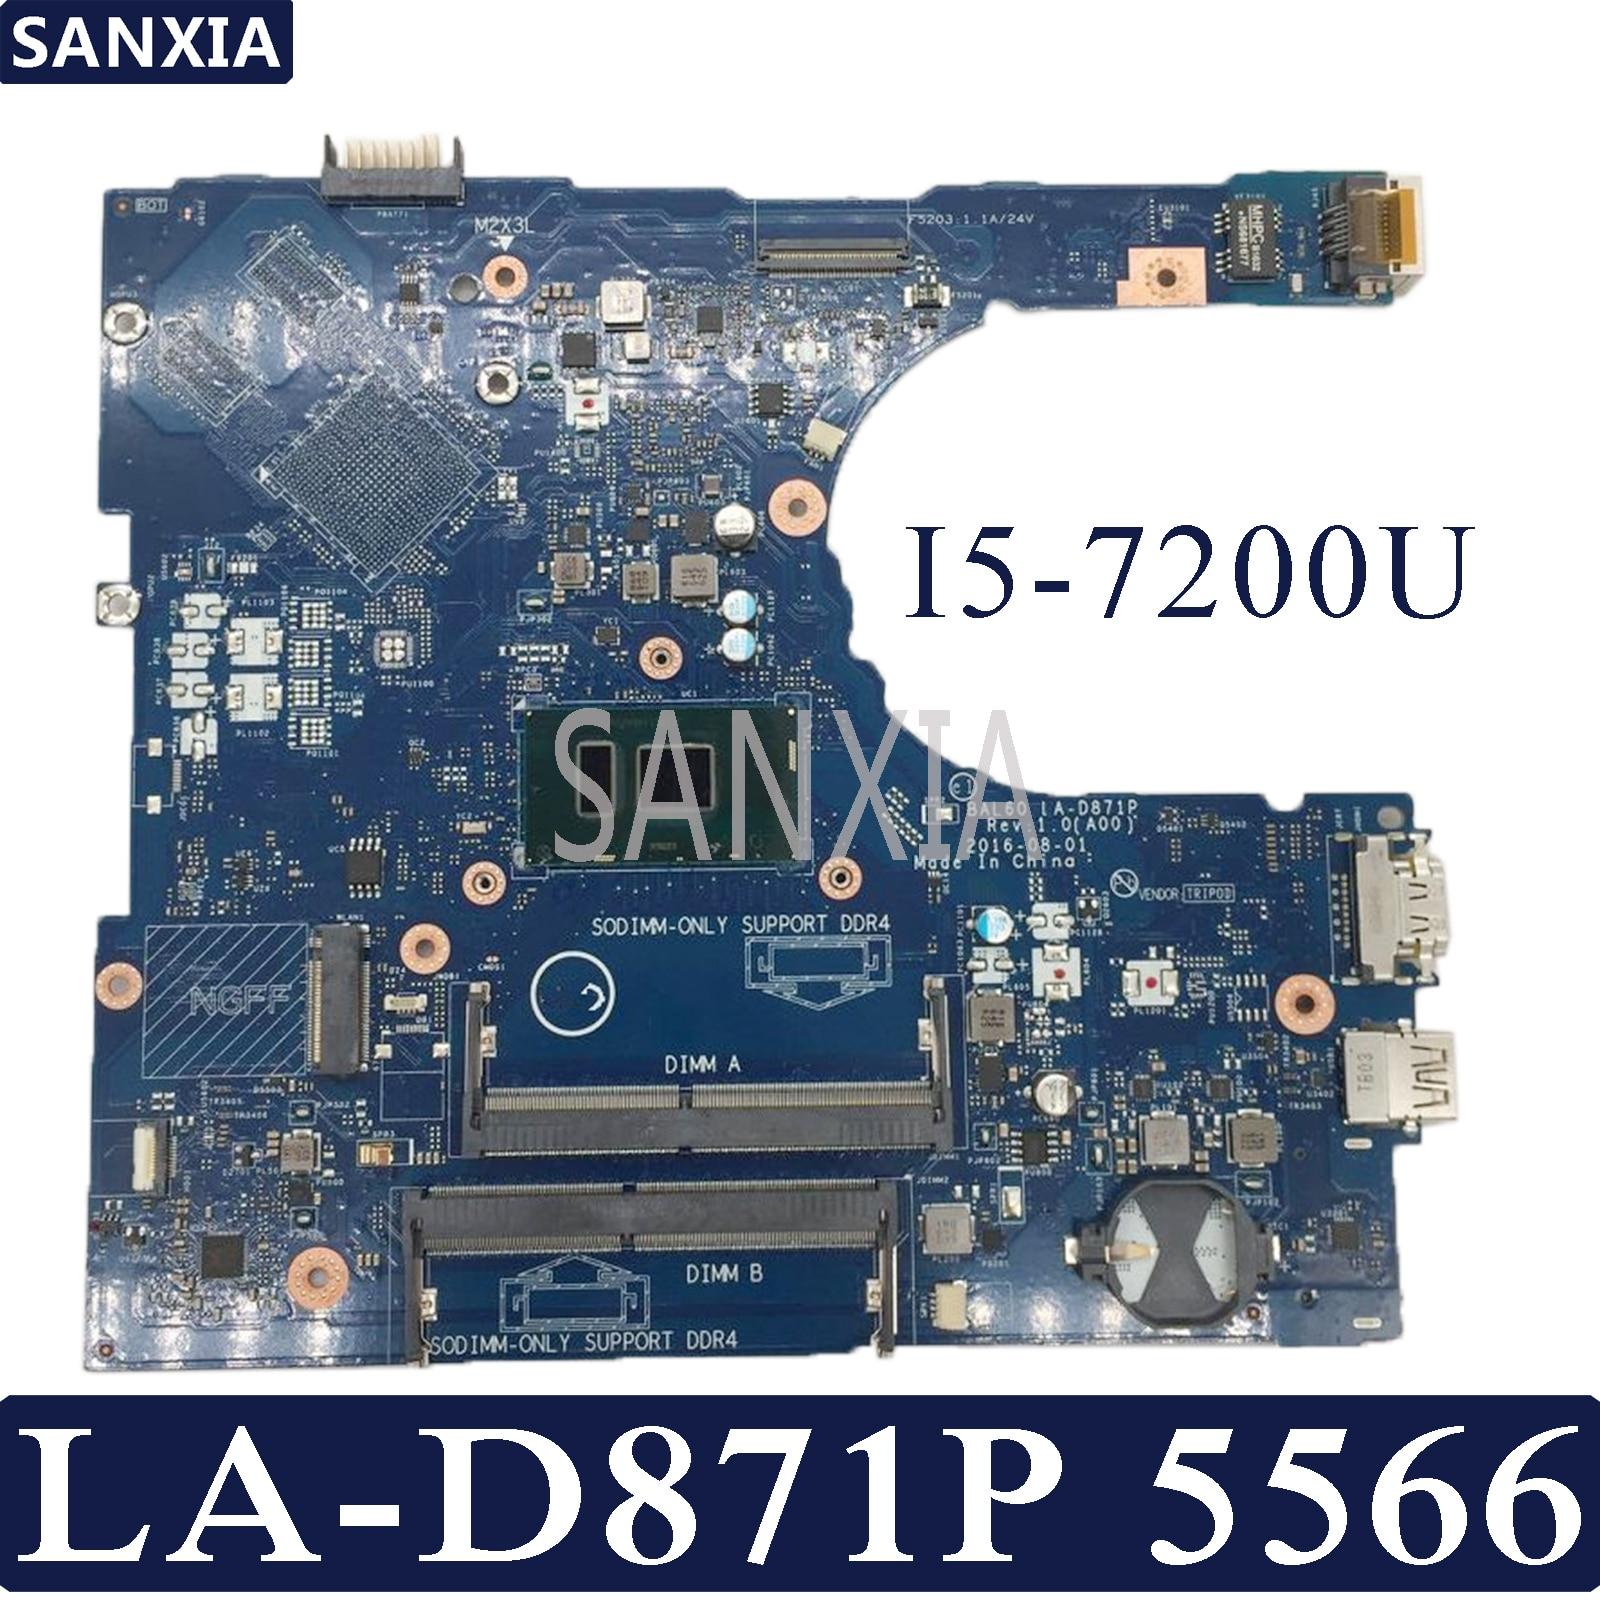 KEFU BAL60 LA-D871P Laptop Motherboard For Dell Inspiron 5566 Test Original Mainboard I5-7200U